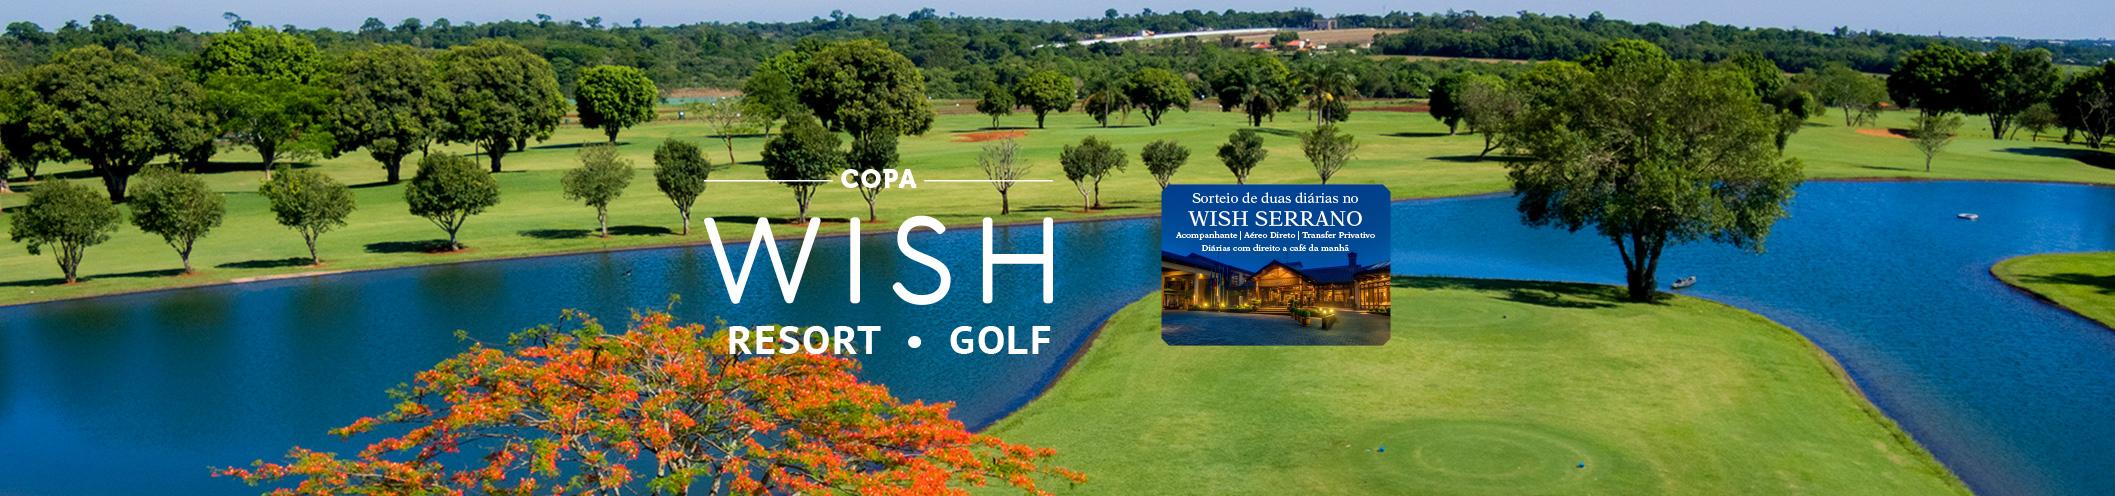 Copa-Wish